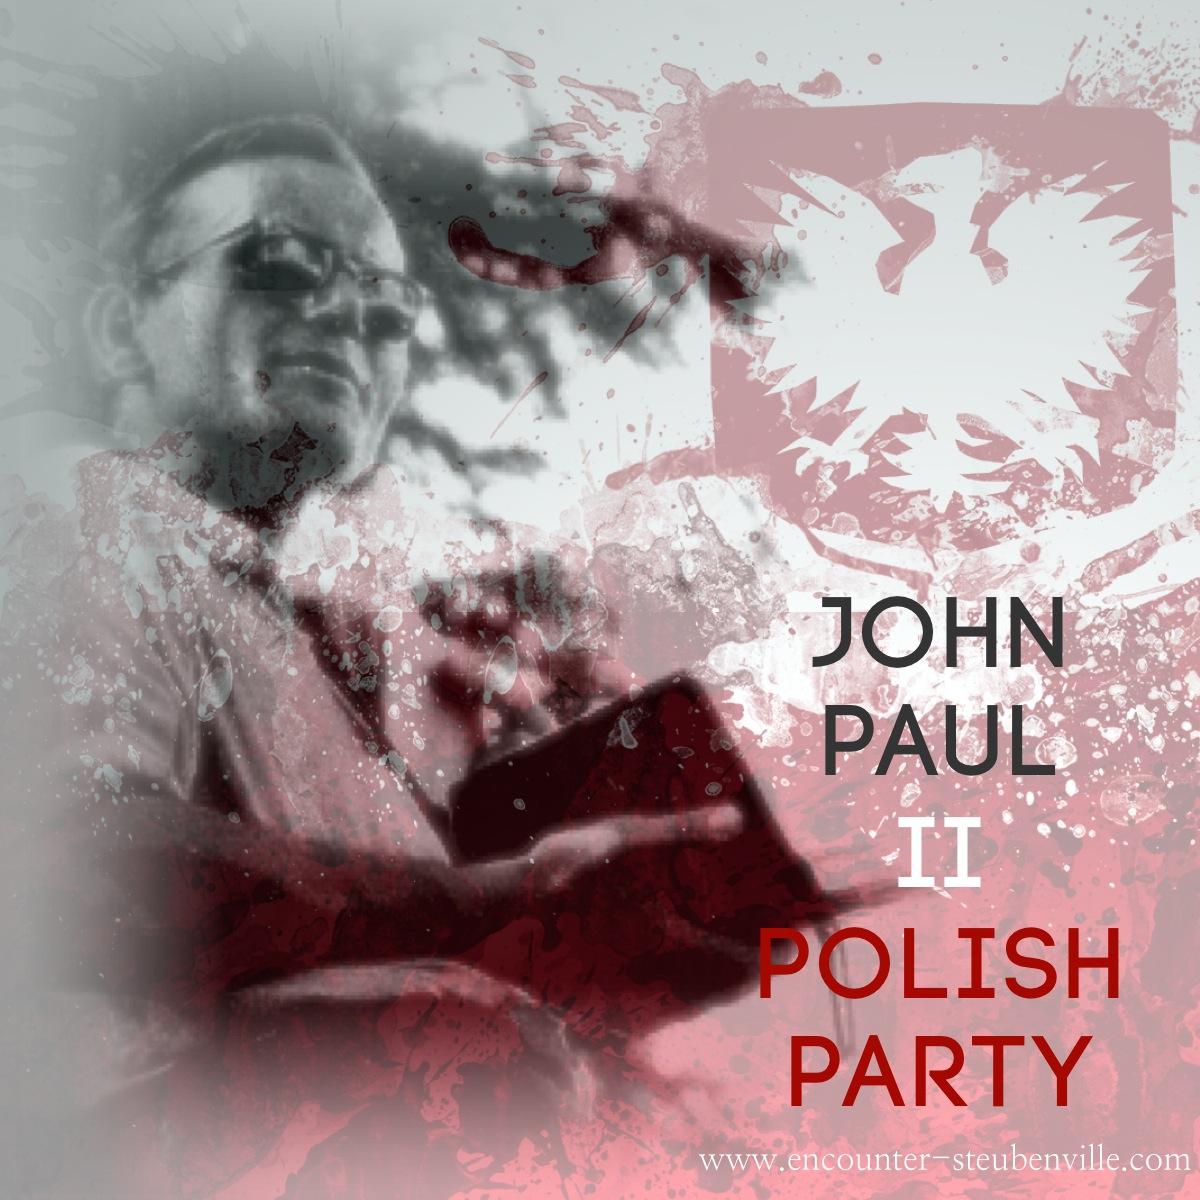 J P2 Polish Party